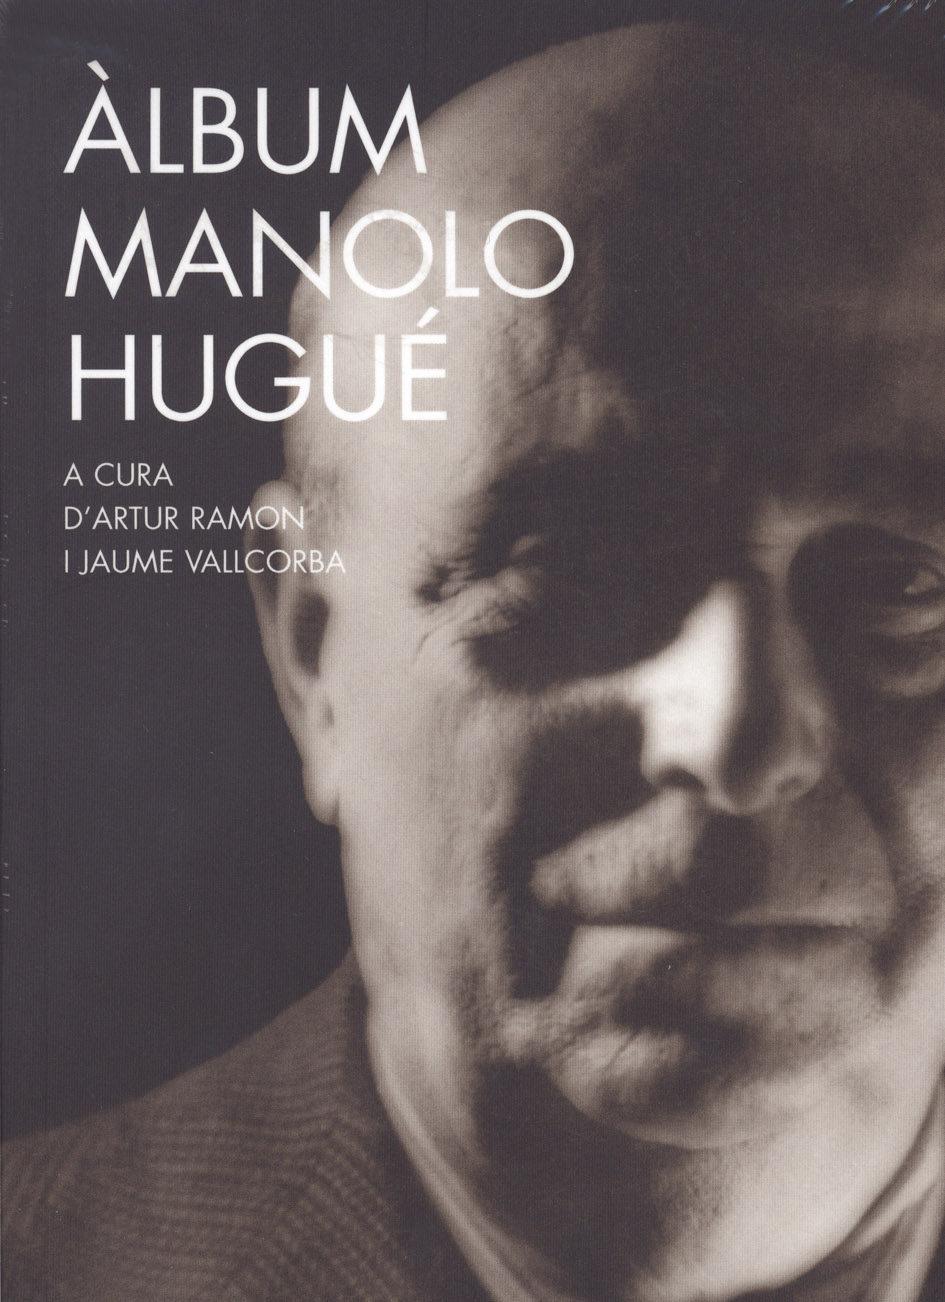 Album: Manolo Hugue por Artur Ramon